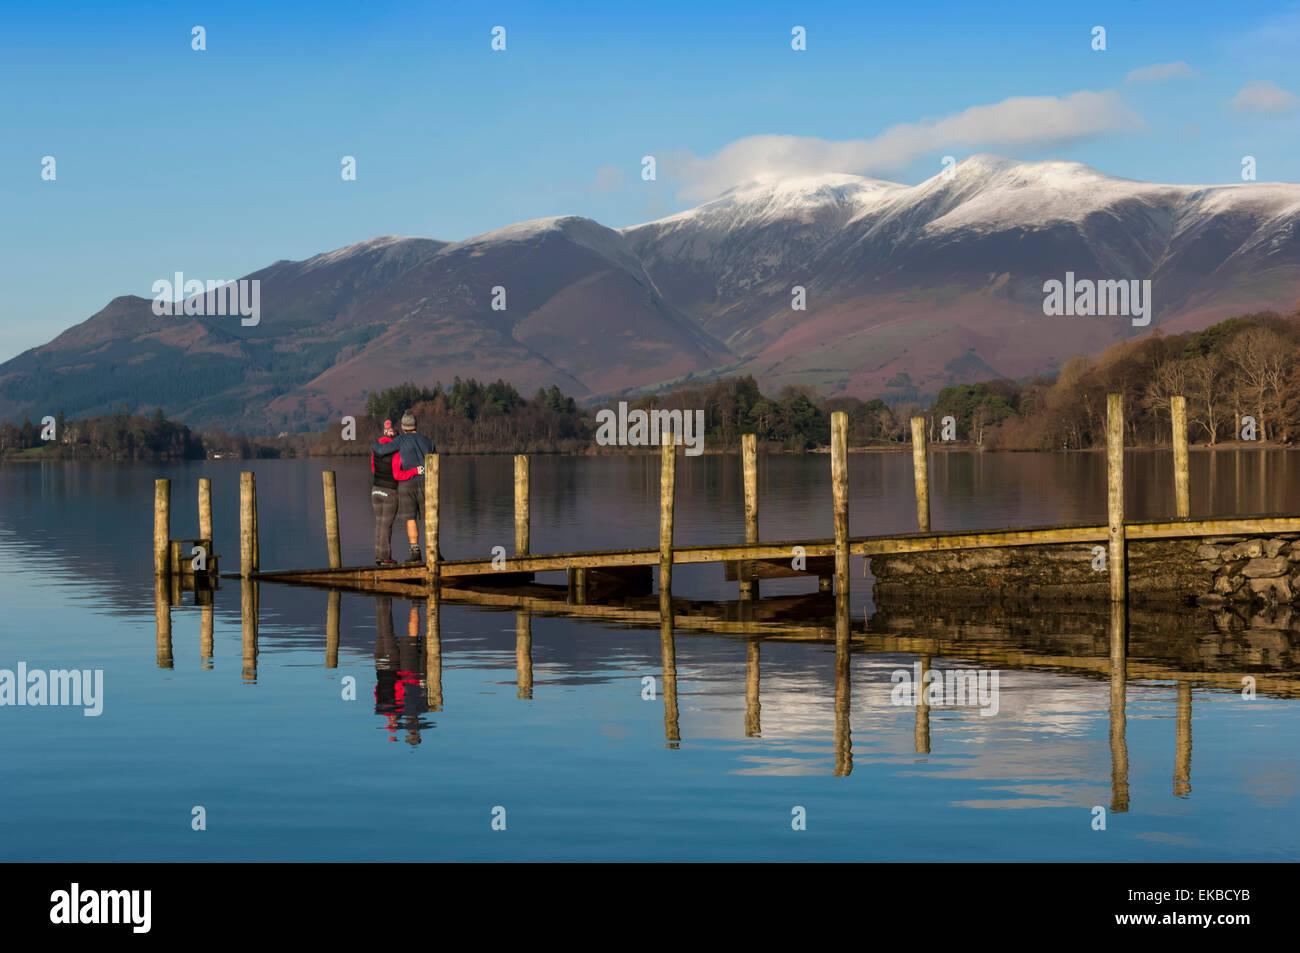 Ashness Boat Landing, Skiddaw, plage de Derwentwater, Keswick, Parc National de Lake District, Cumbria, England, Photo Stock